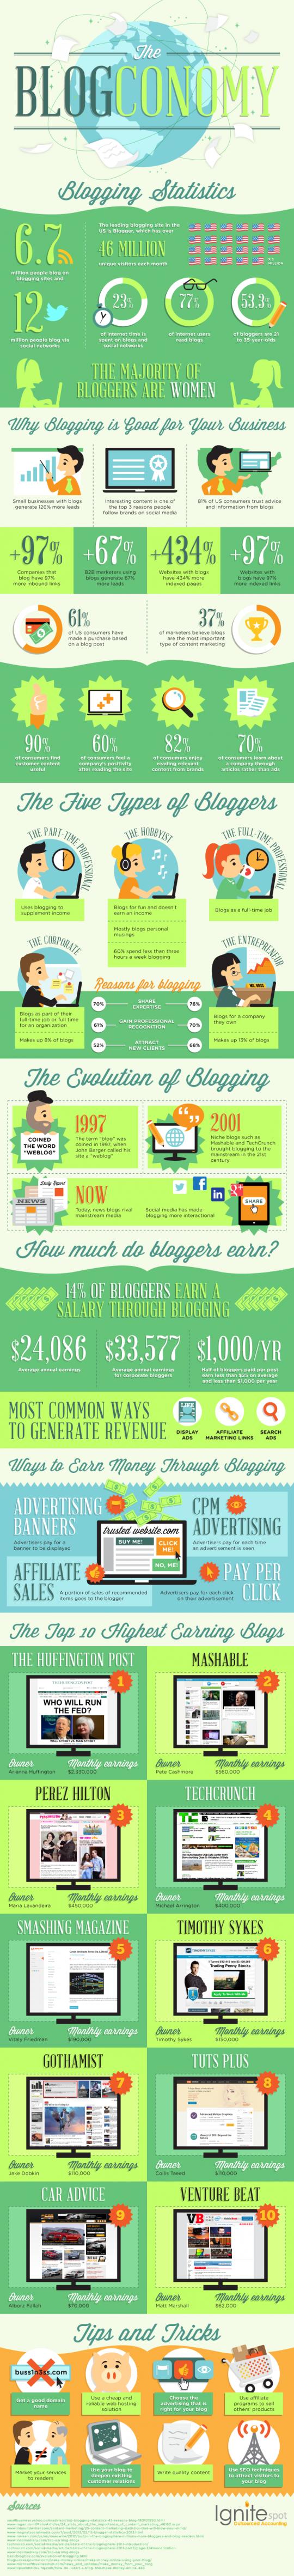 The Blogconomy